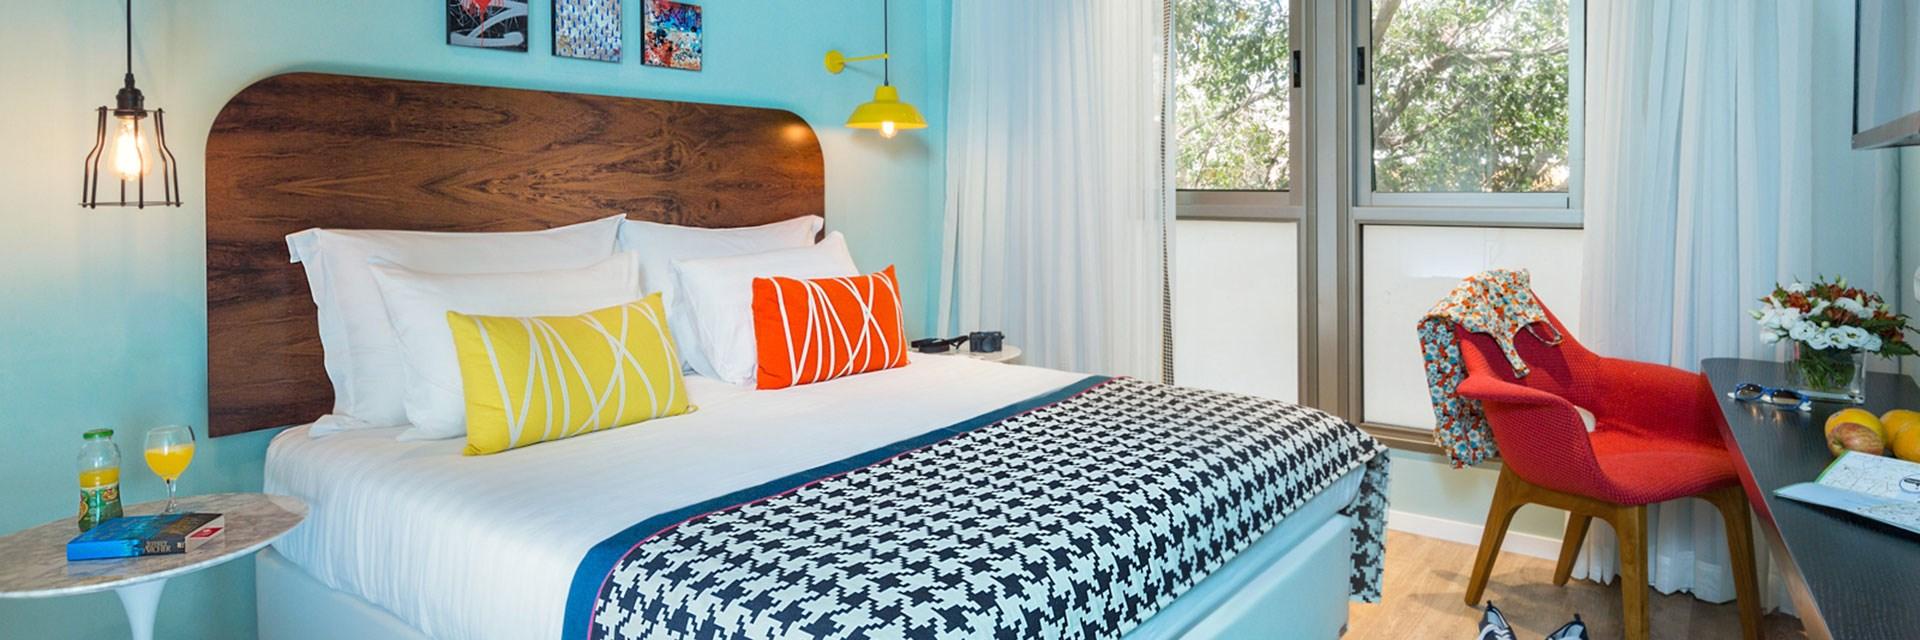 Hotel 75 Urban Room